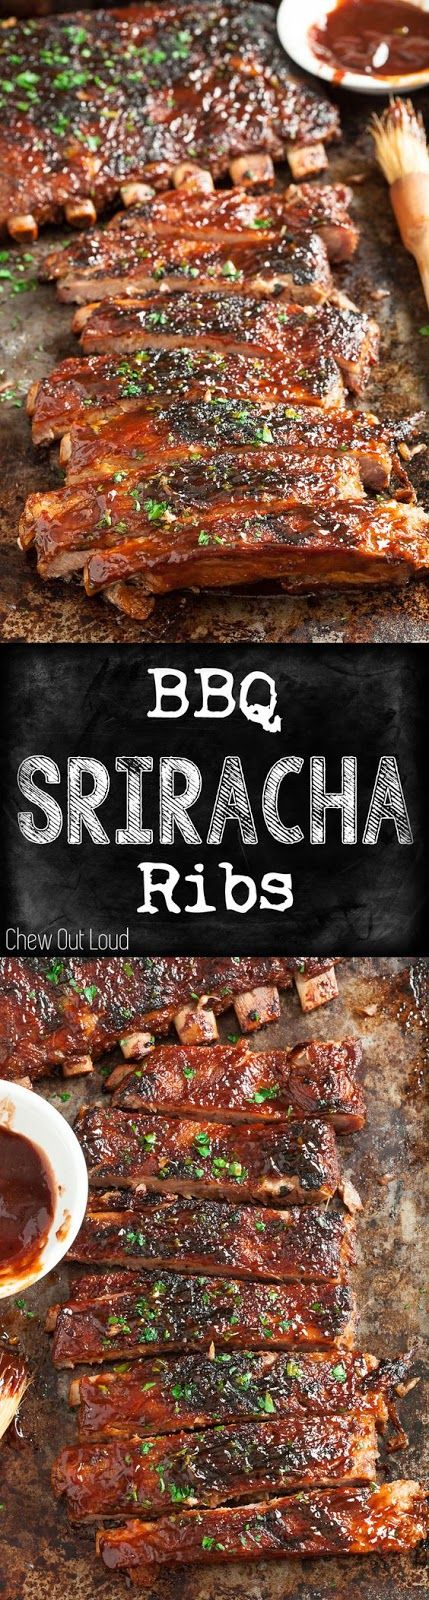 BBQ SRIRACHA RIBS | Food And Cake Recipes